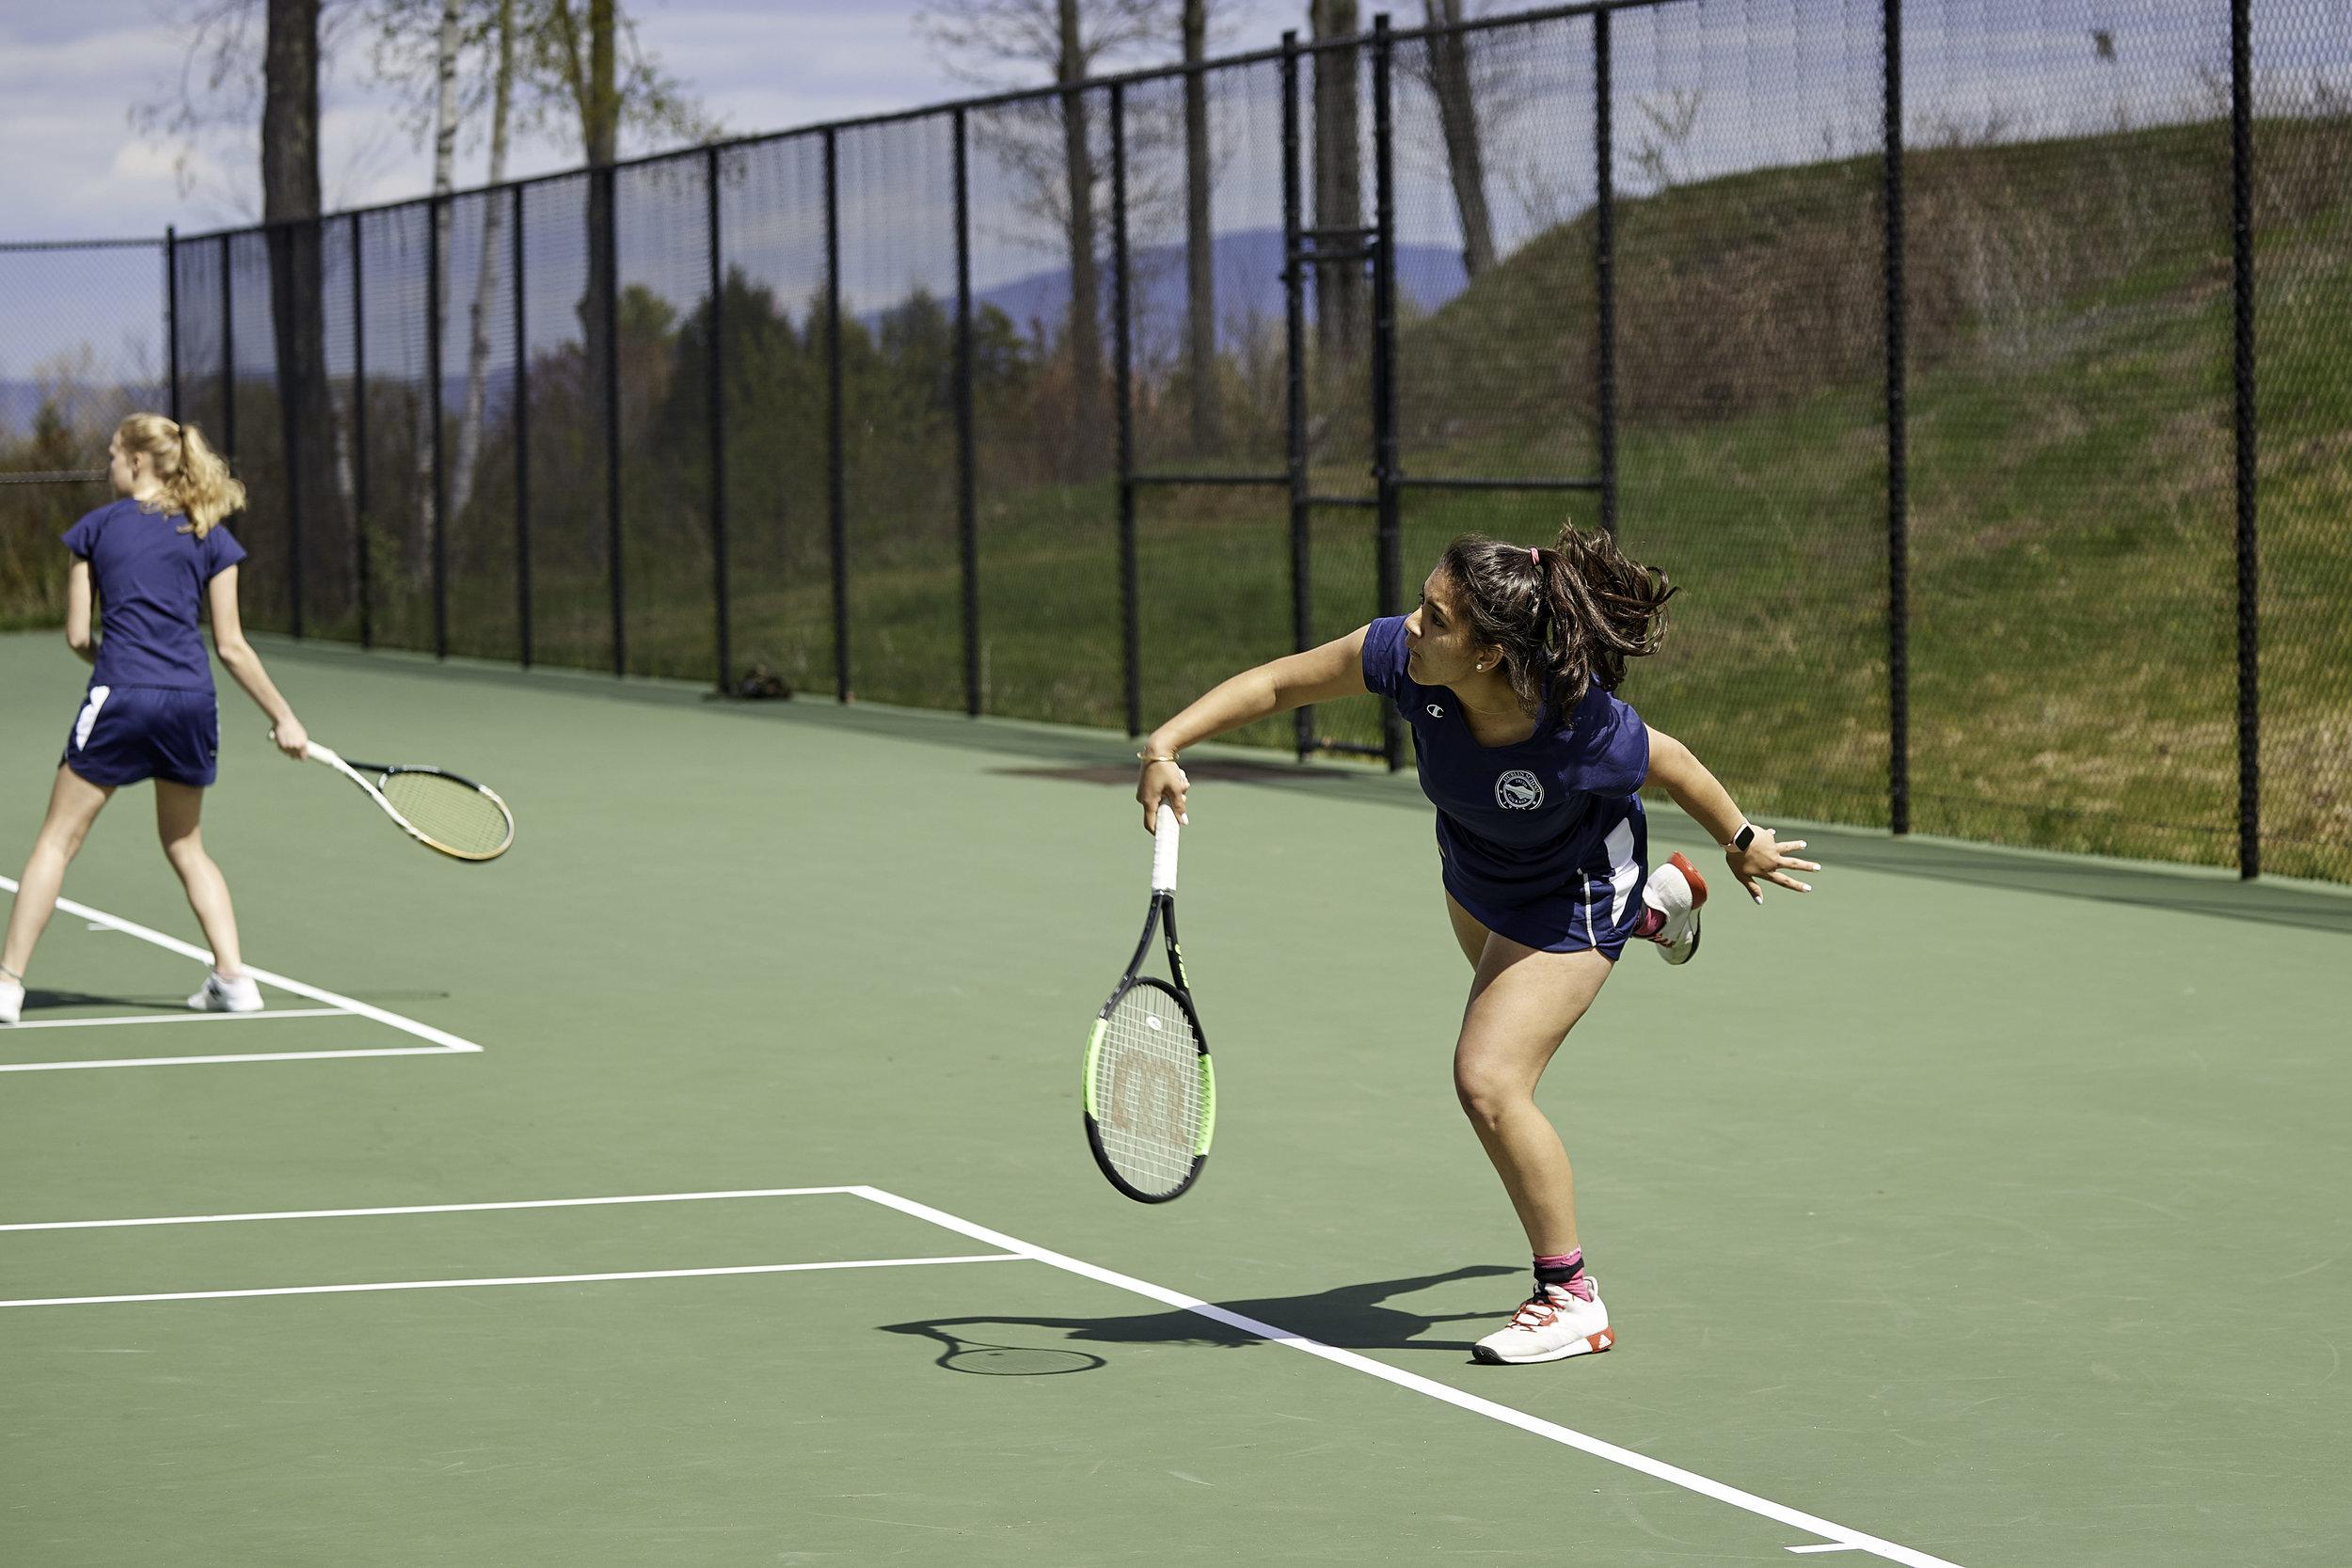 Girls Tennis vs. Winchendon School - May 15, 2019 -195180.jpg